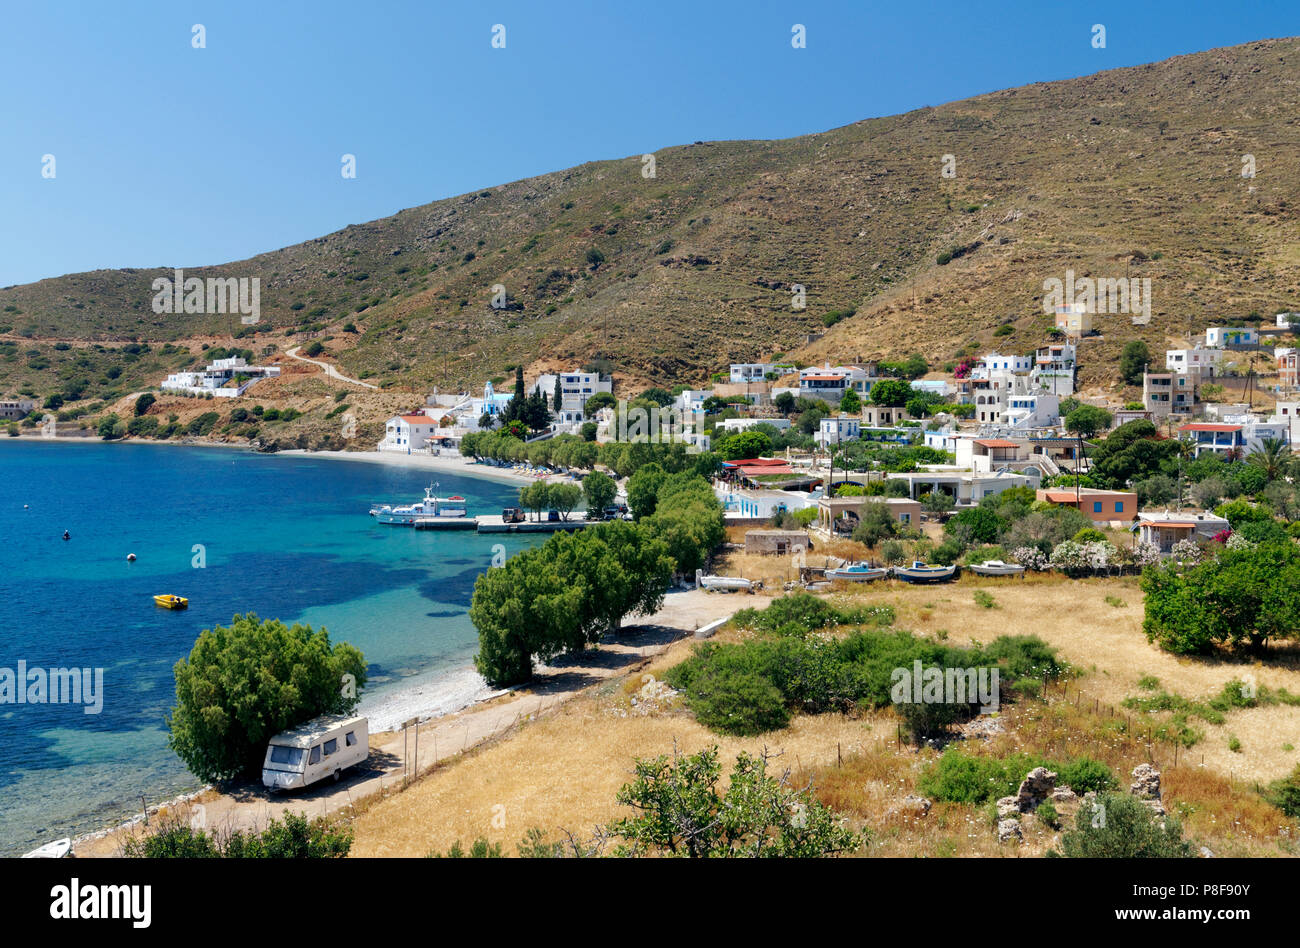 Emborios, Kalymnos or Kalimnos, Dodecanese Islands, Greece. - Stock Image